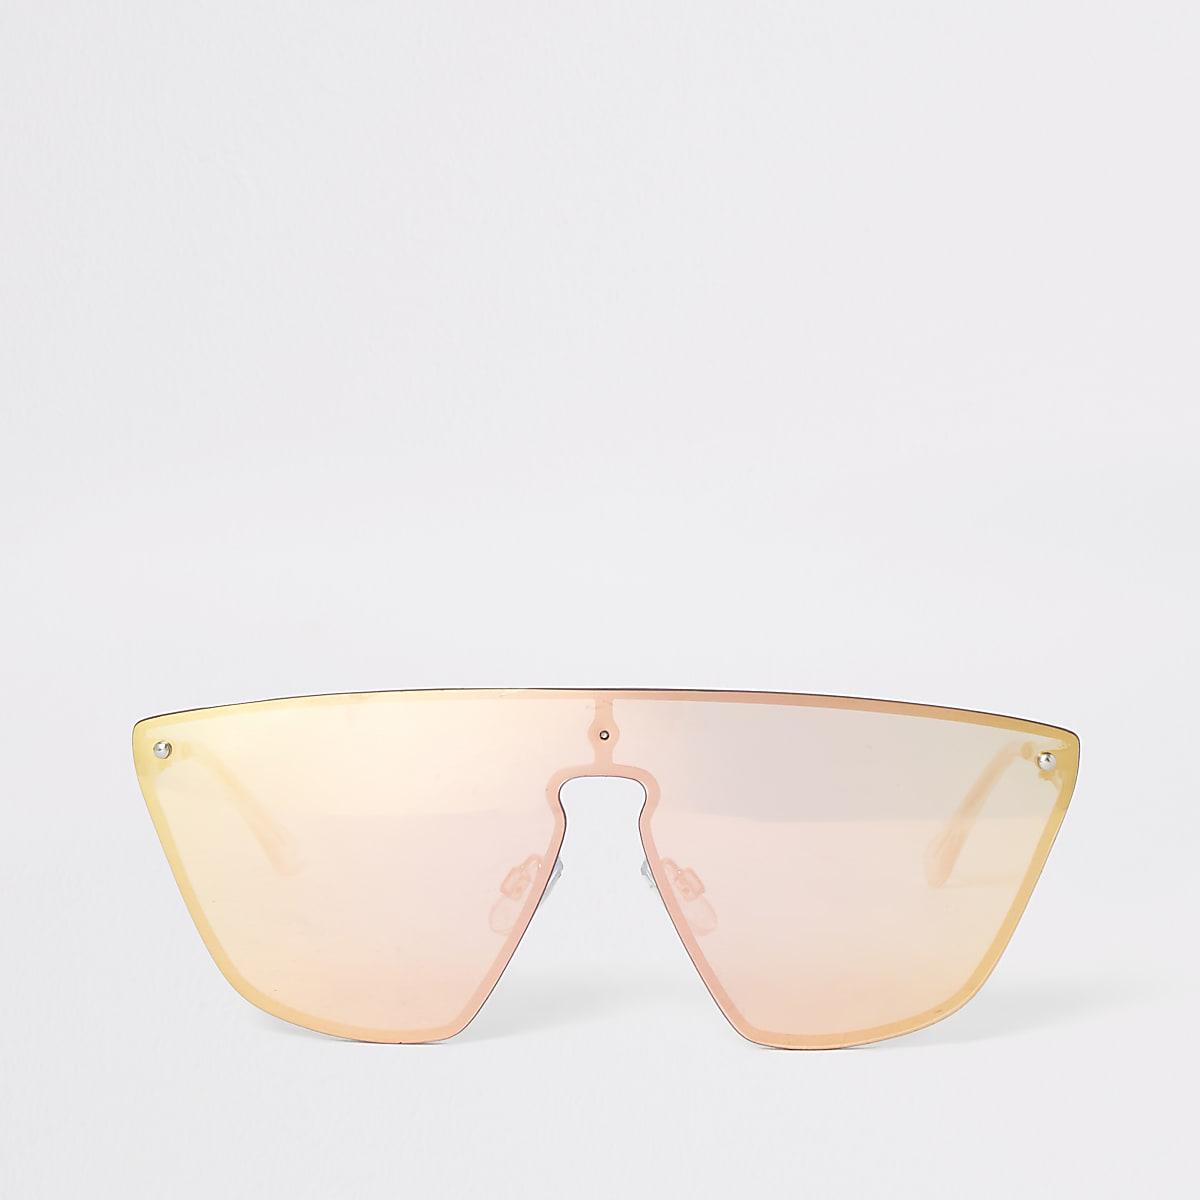 Goudkleurige zonnebril in visor-stijl